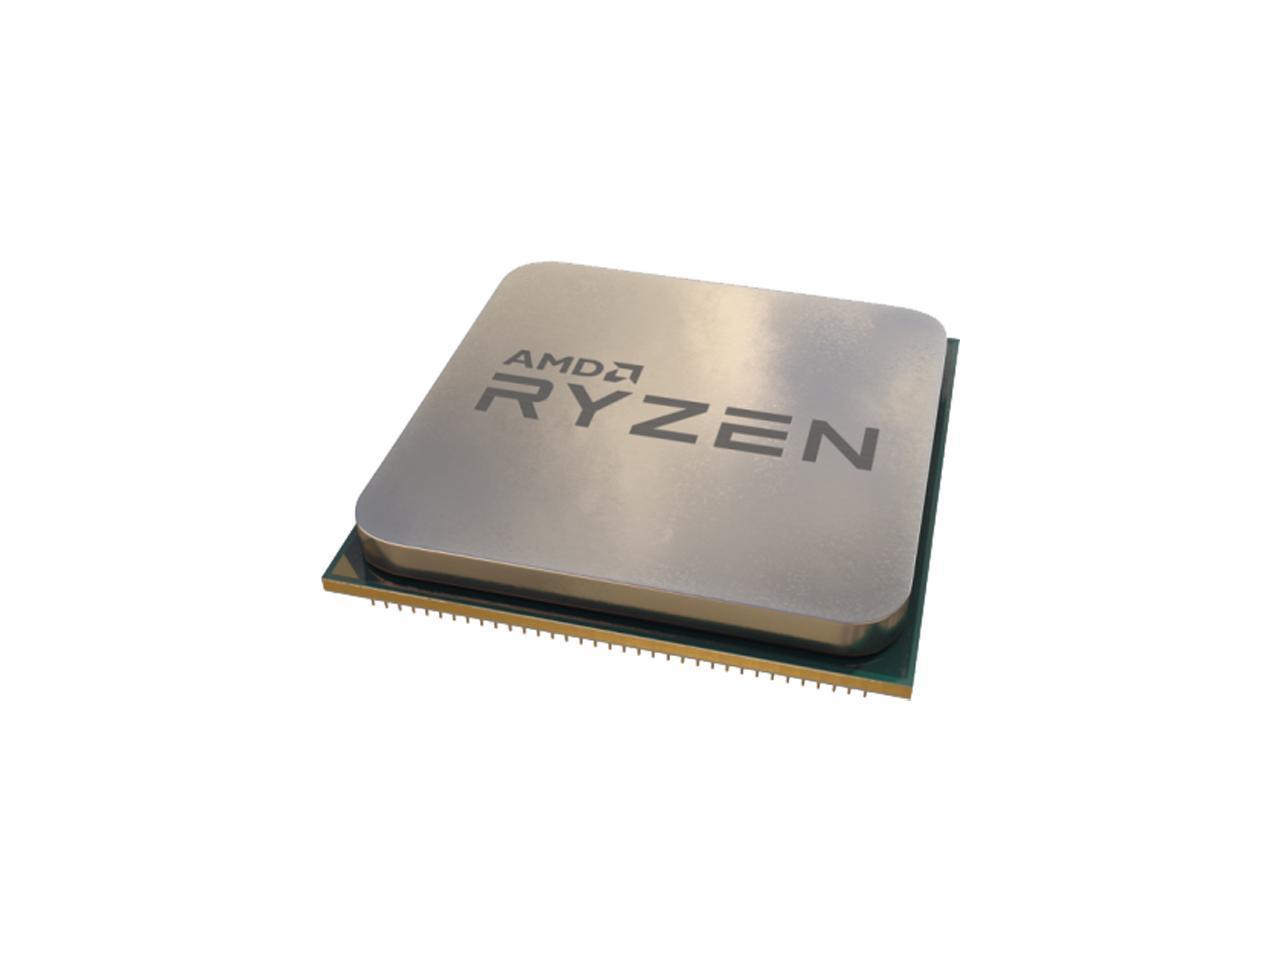 Amd Ryzen 5 3600x 6 Core 3 8 Ghz 4 4 Ghz Max Boost Socket Am4 95w 100 10000002 783555269381 Ebay